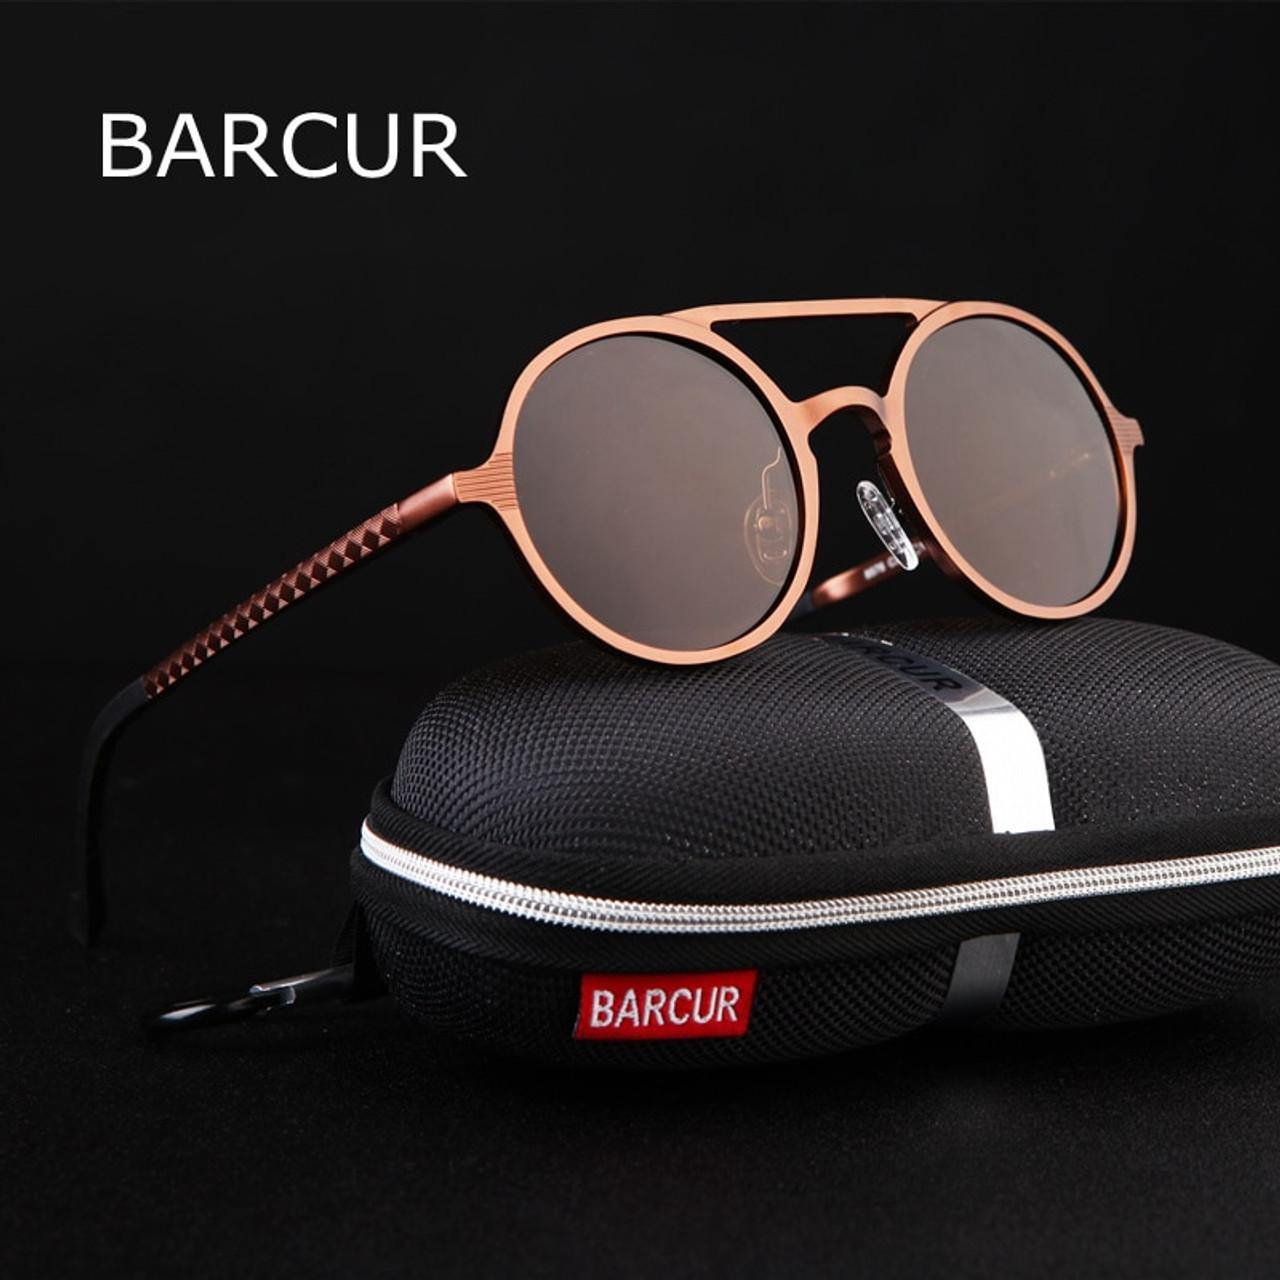 f76d620665 ... BARCUR Vintage Aluminum Magnesium Sun glass Men Polarized Sunglasses  Round Steampunk Shades Brand Designer Eyewear ...